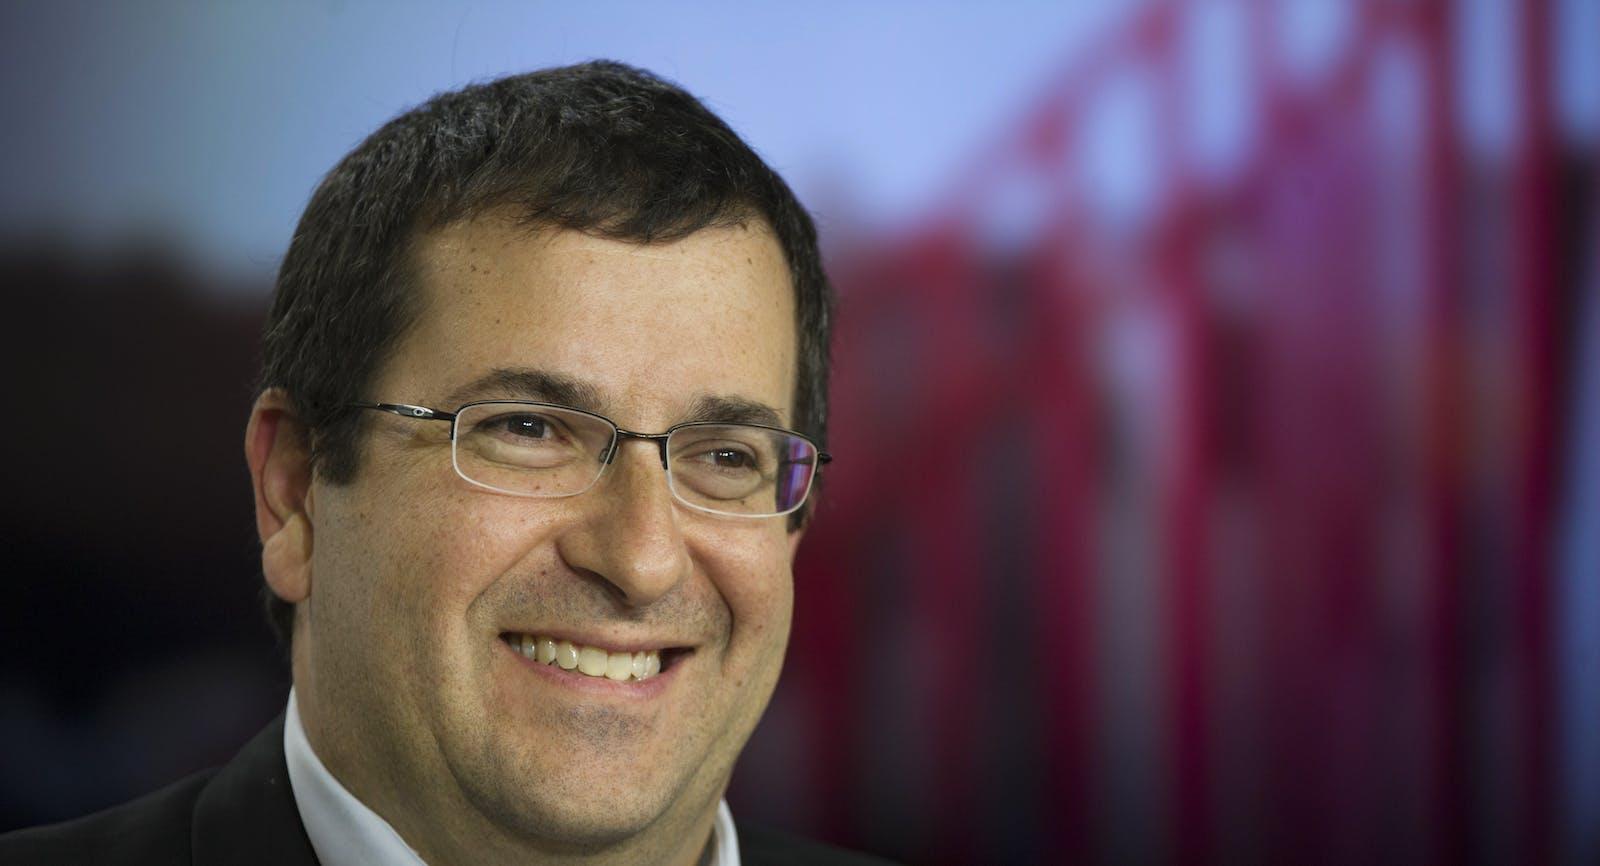 Dave Goldberg. Photo by Bloomberg.